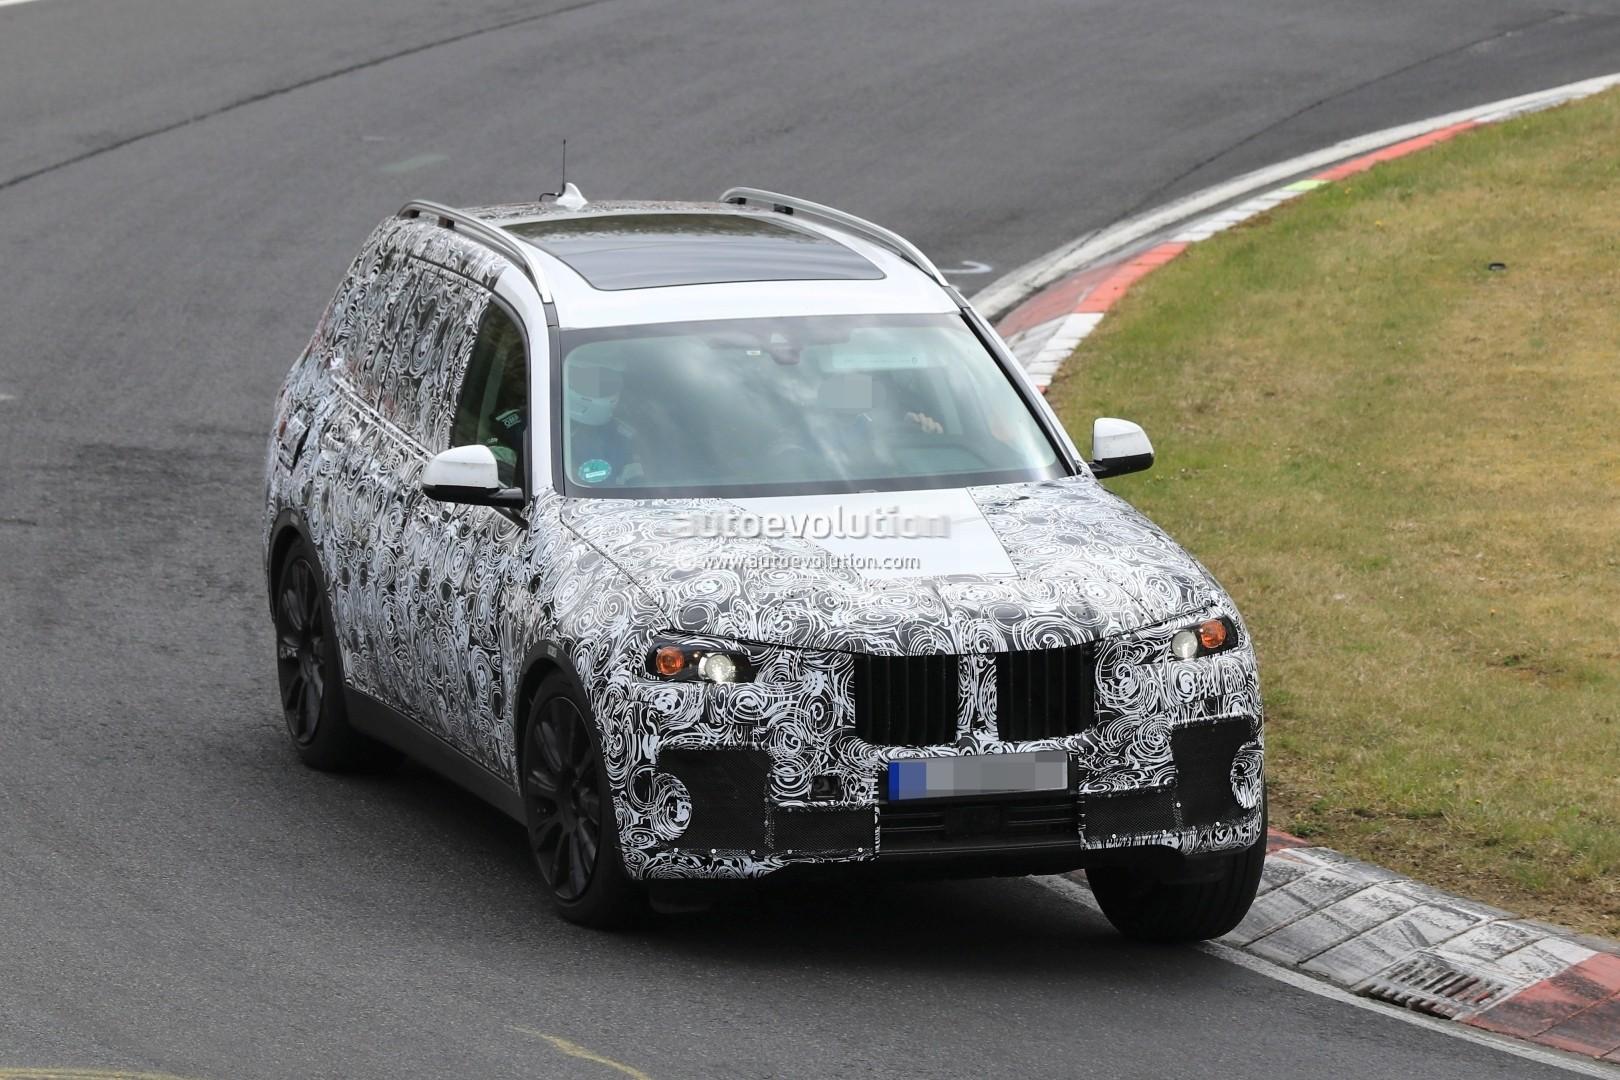 2018 BMW X7 Hits the Nurburgring Prototype Tilts like a Bavarian